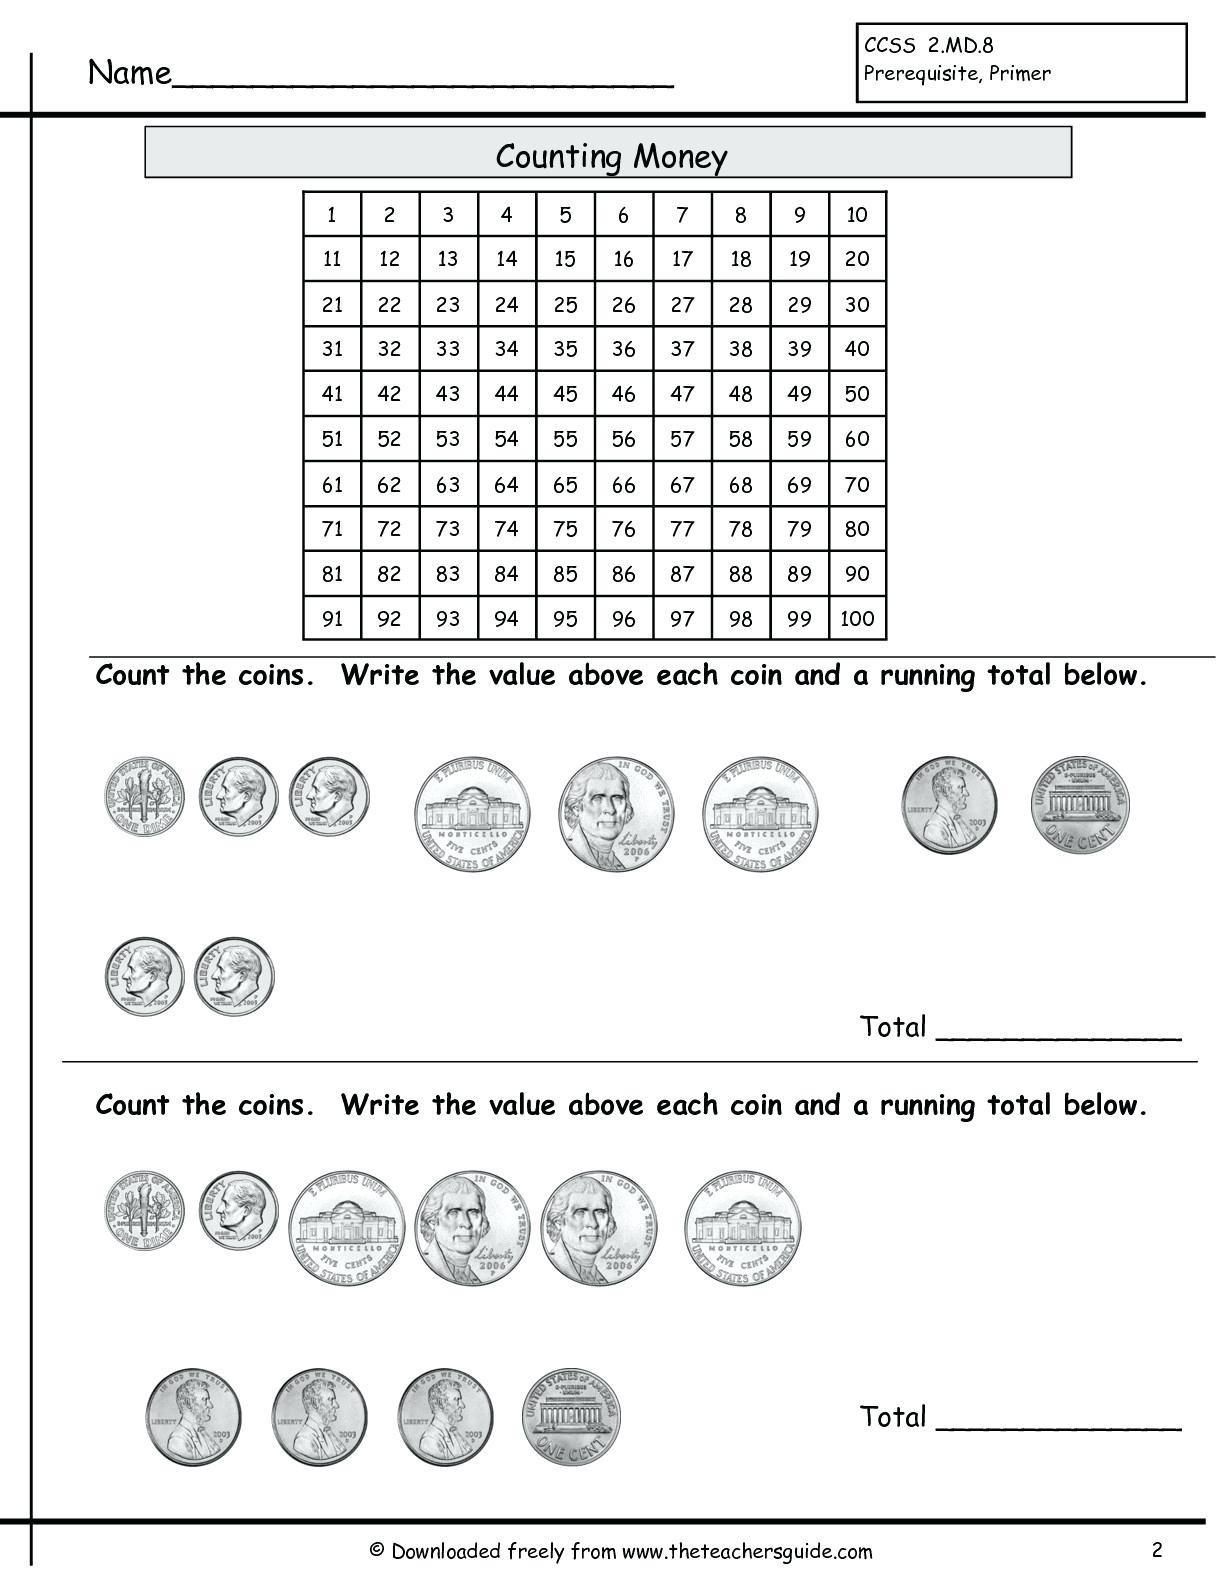 2nd Grade Math Worksheets Measurement 5 Free Math Worksheets Second Grade 2 Counting Money Money